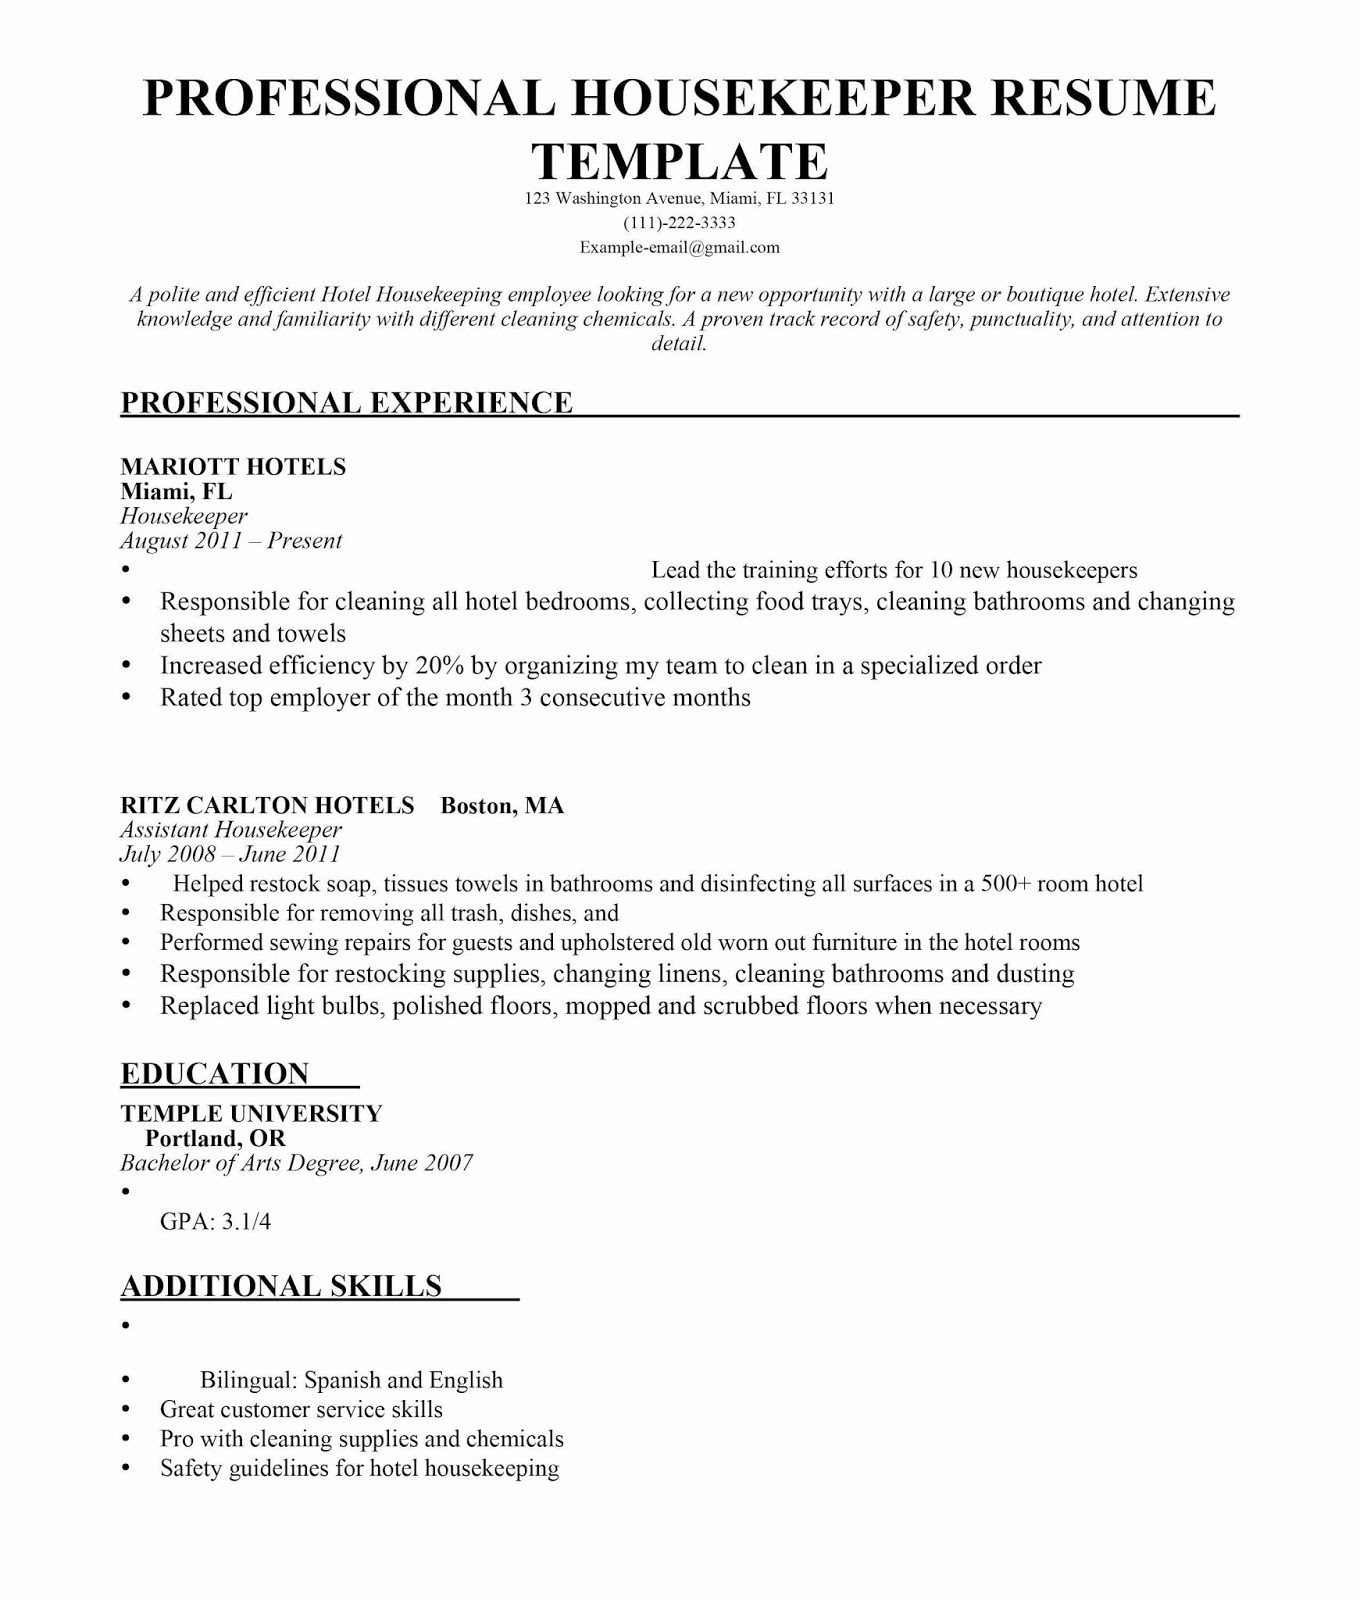 Housekeeping Resume Sample 2019 Pdf Doc Resume Objective 2020, housekeeping resume sample , housekeeping resume sample pdf, housekeeping resume sample hospital, housekeeping resume sample australia, housekeeping resume sample, housekeeping resume sample objective, housekeeping cv sample uk, housekeeping cv sample, housekeeping cv sample doc, housekeeping cv sample pdf, housekeeping curriculum vitae sample